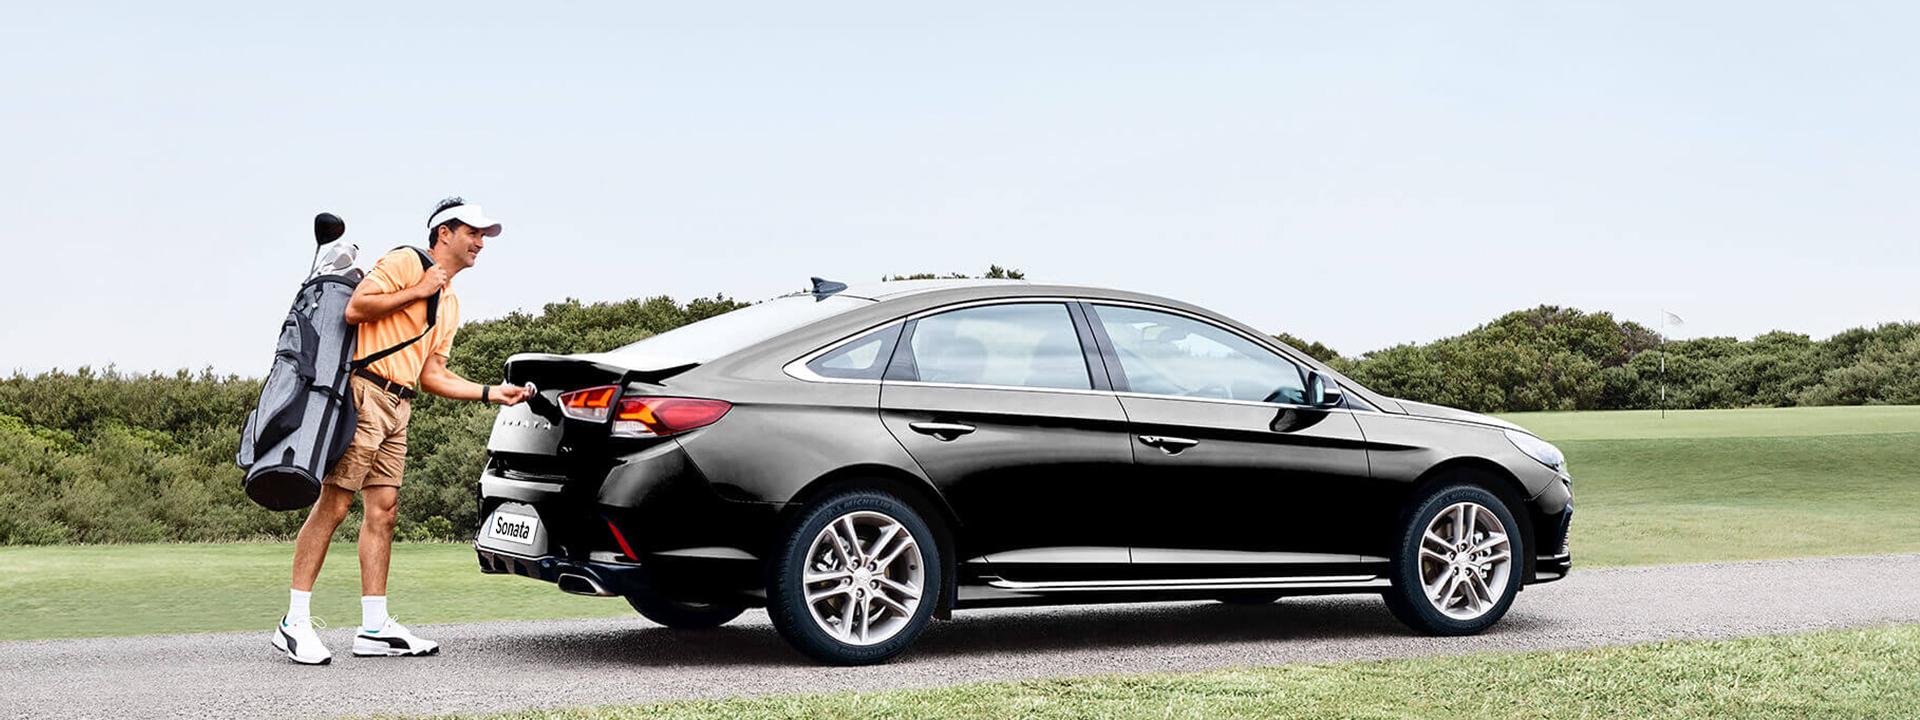 Hyundai Sonata Exterior Shot